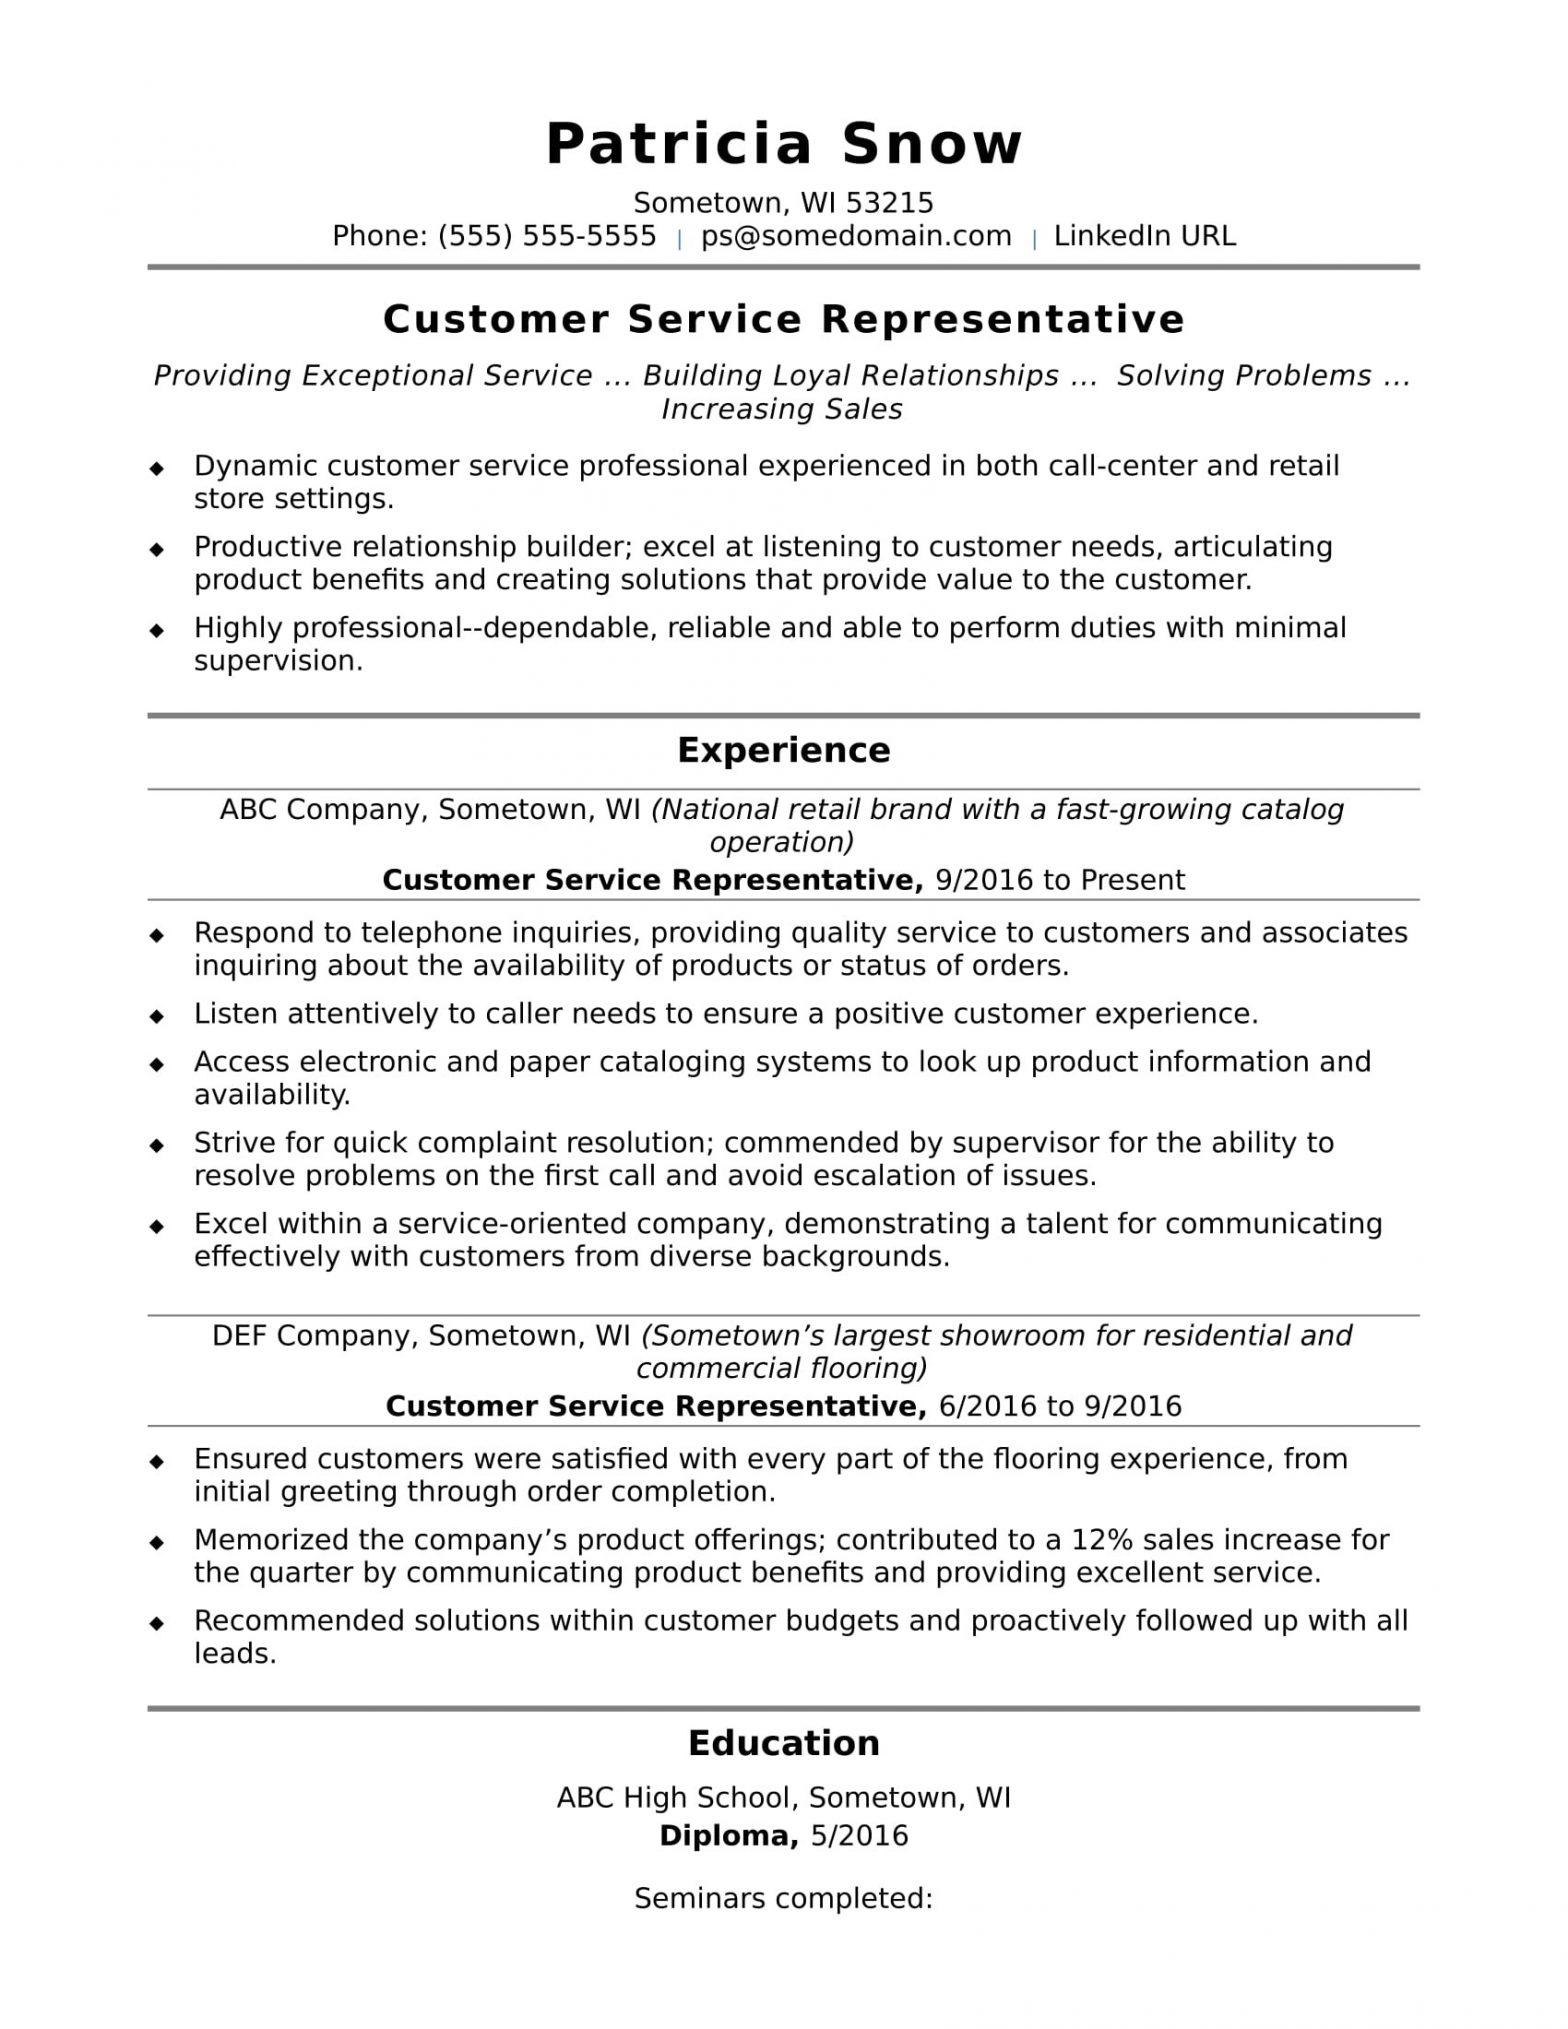 Sample Resume for Customer Care Representative Customer Service Representative Resume Sample Monster.com